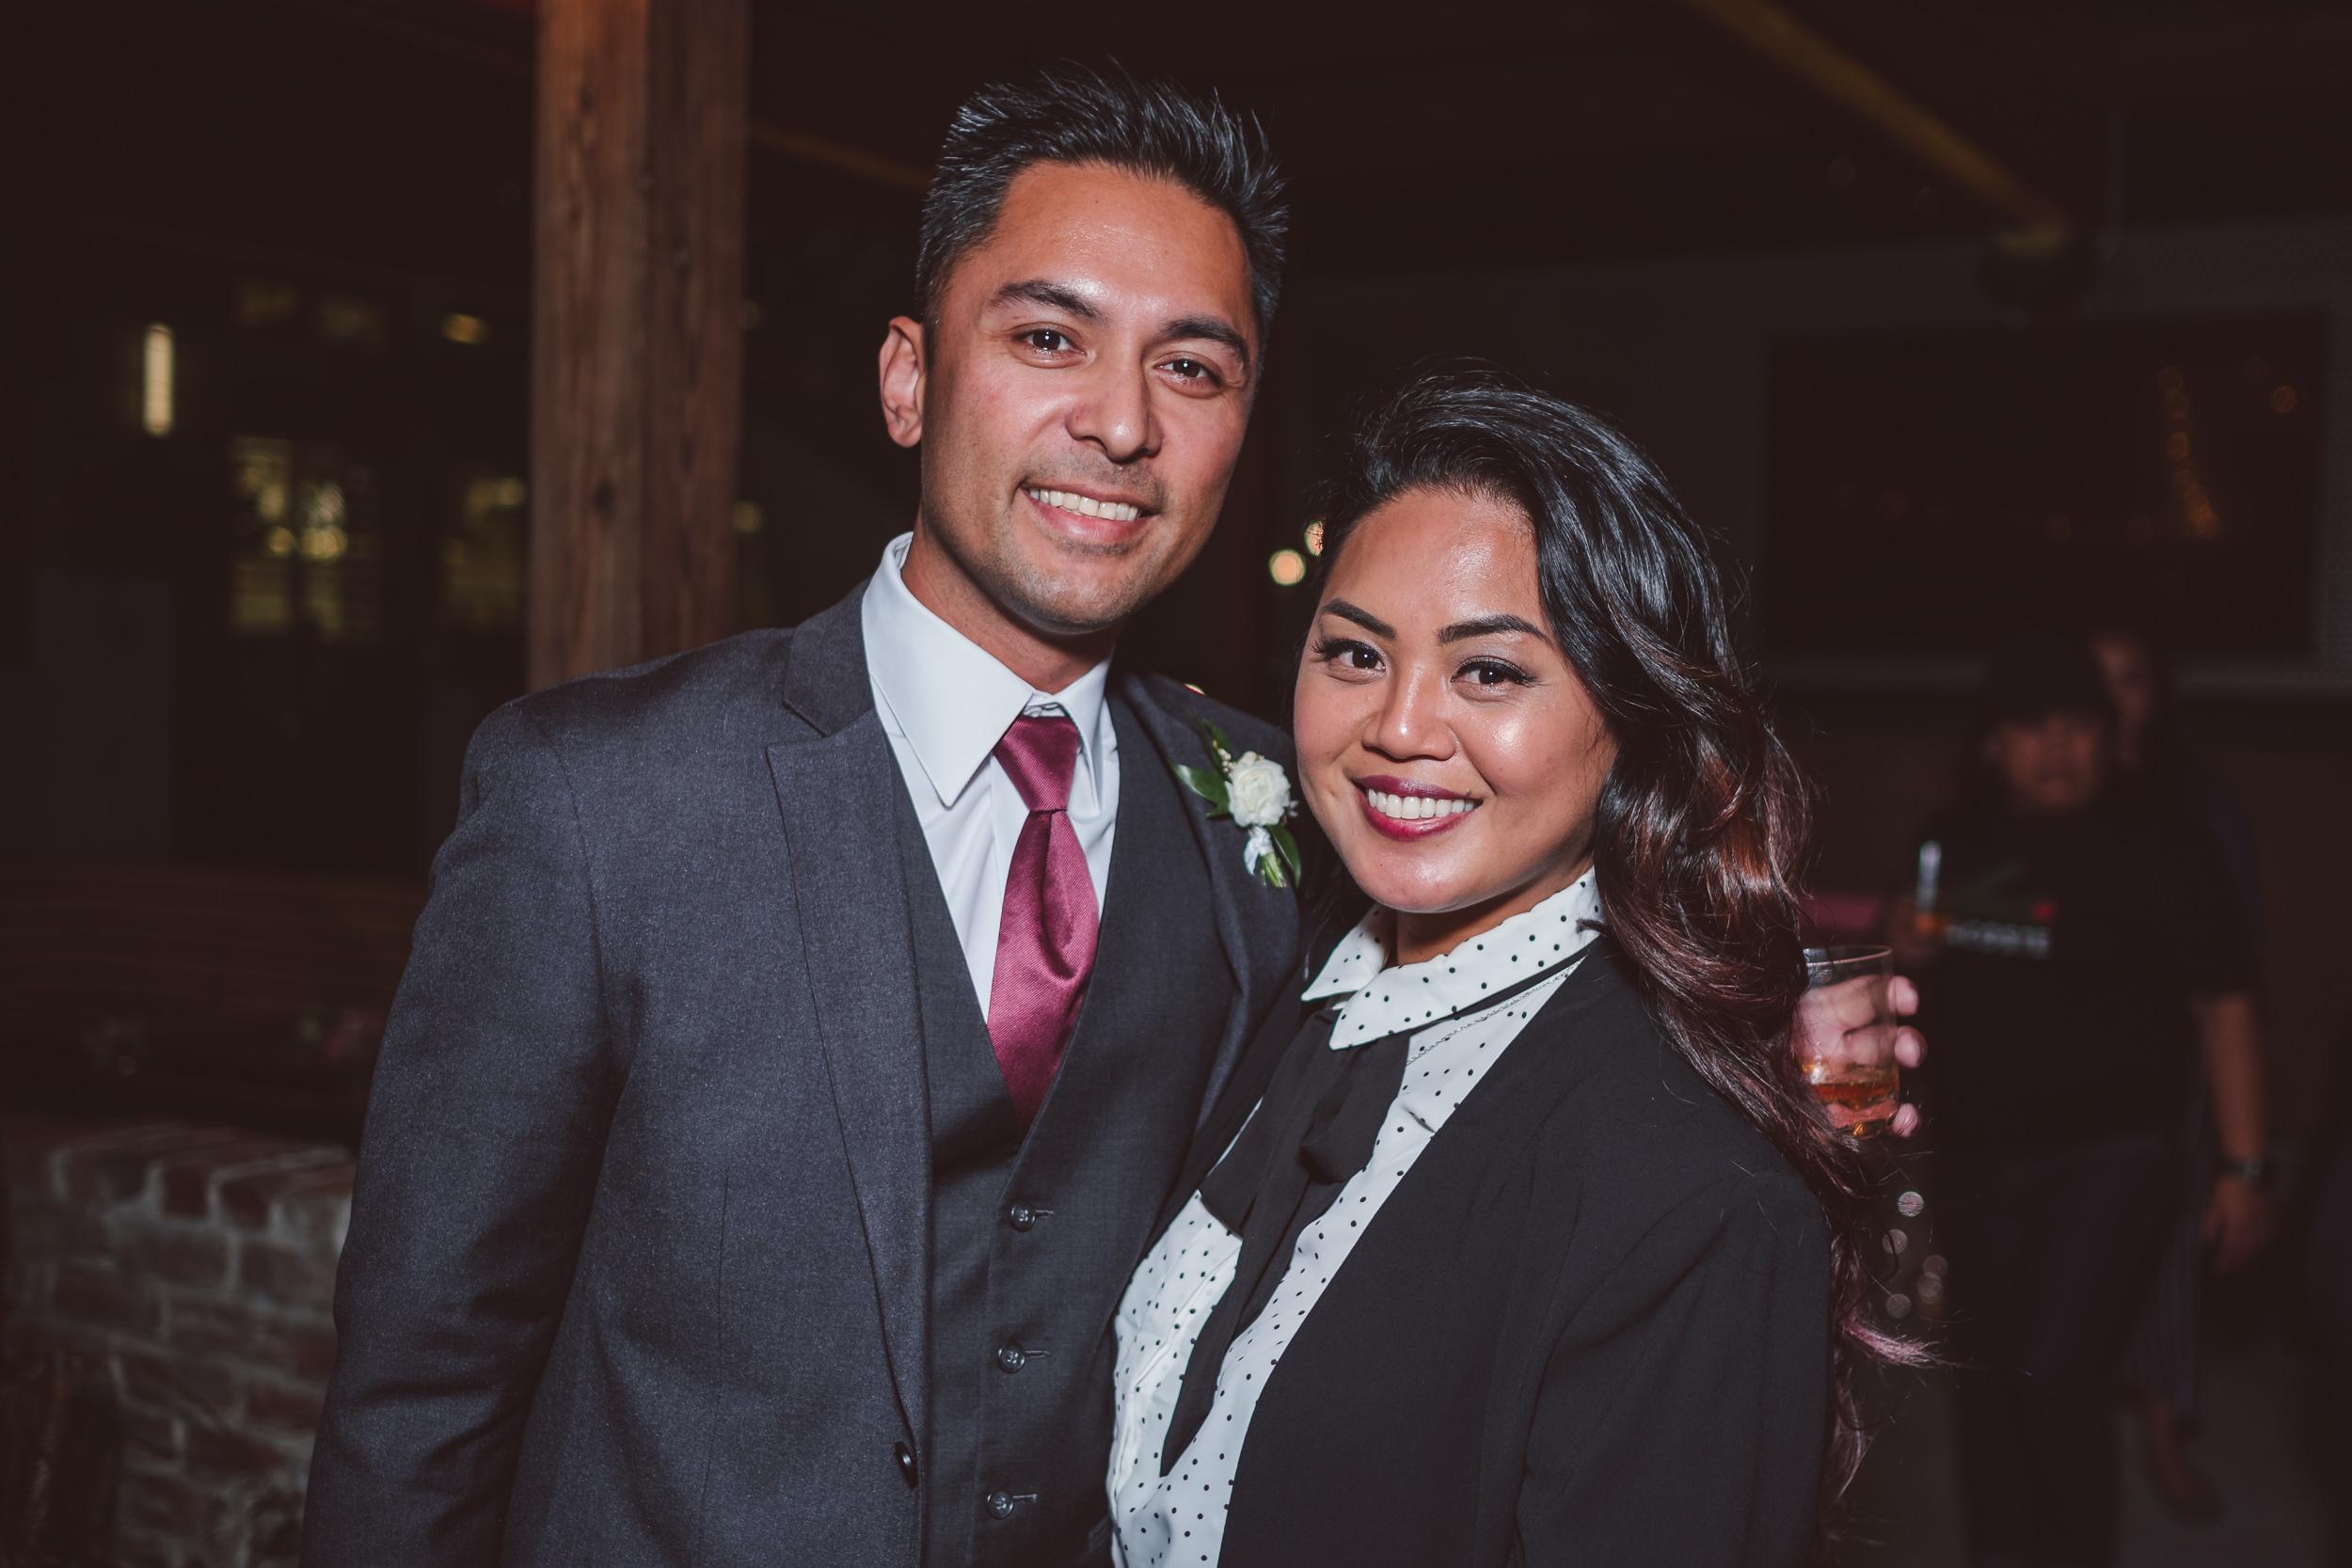 San-Francisco-City-Hall-Wedding-Photography-092.jpg